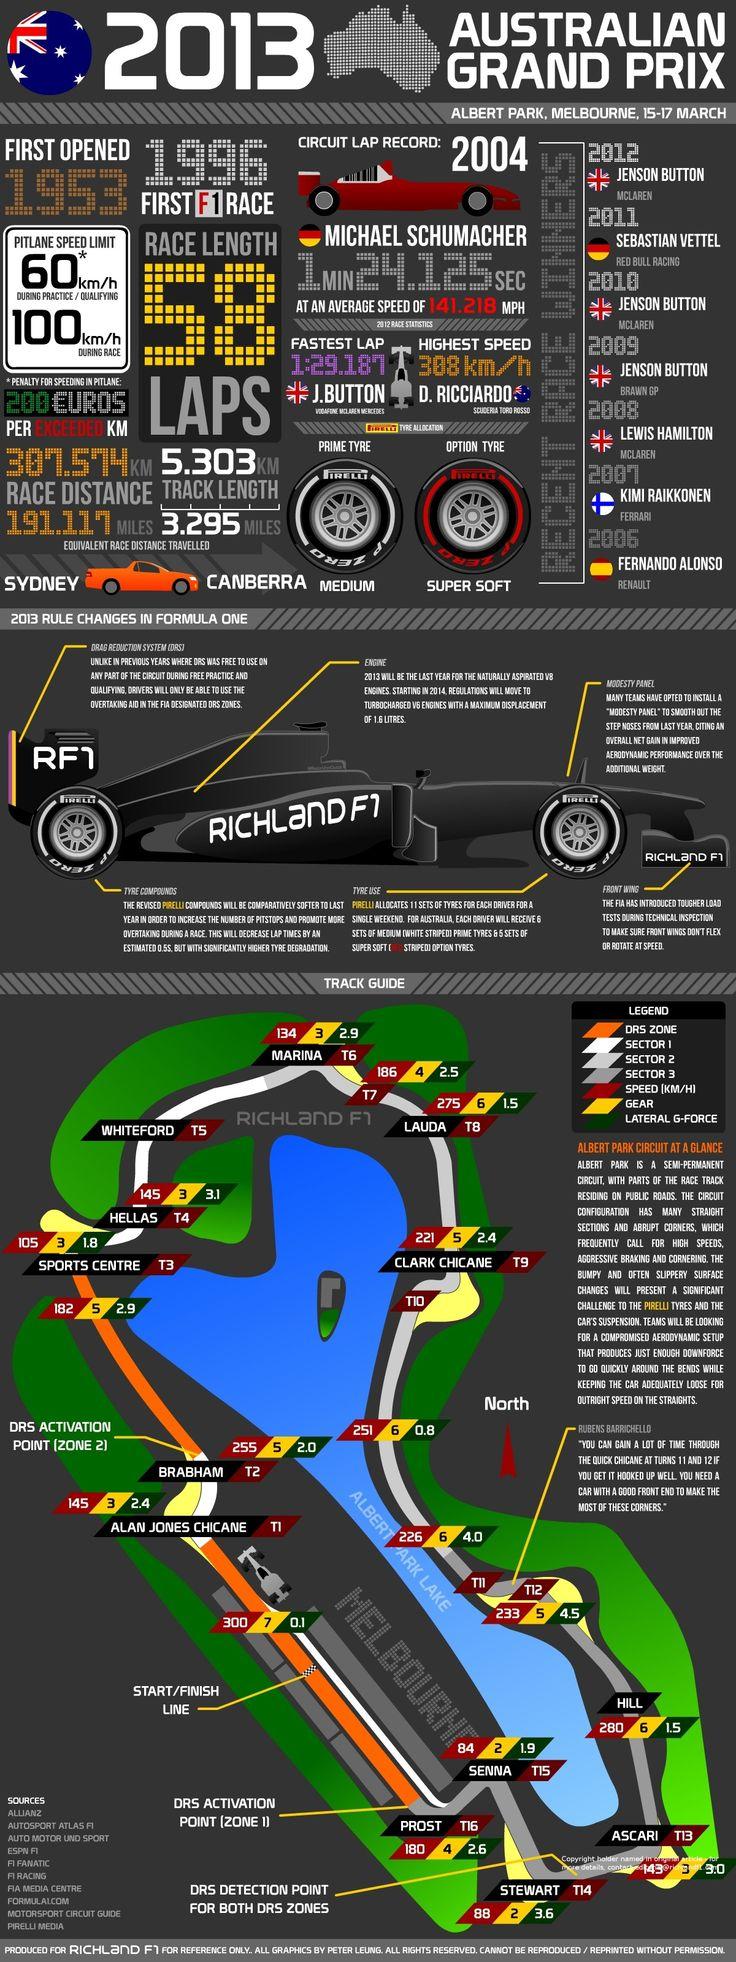 2013 Australian Grand Prix - Facts and Figures (RichlandF1) #F1 #AusGrandPrix